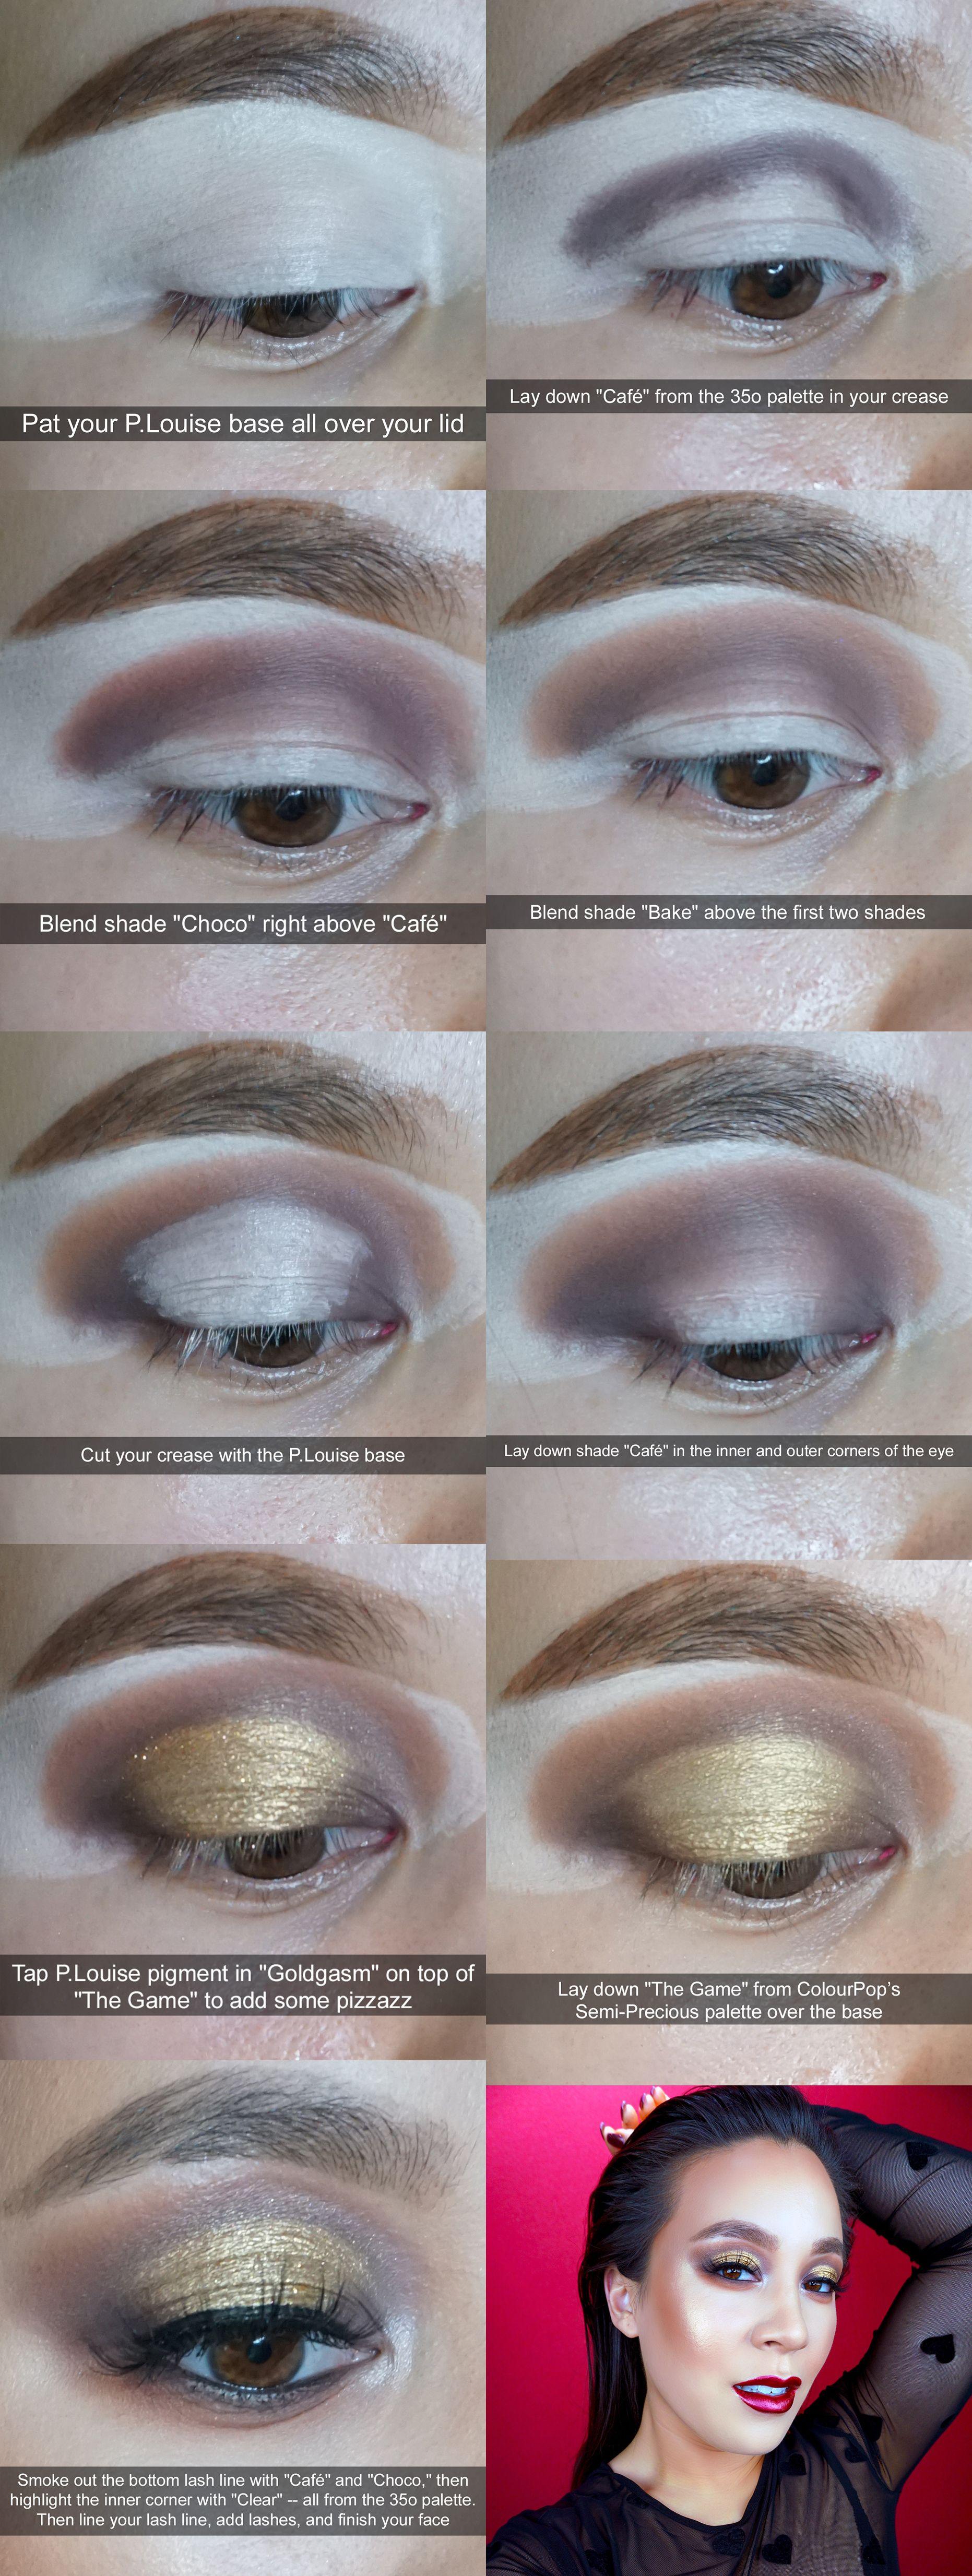 A stepbystep bronze and gold halo eye eyeshadow tutorial